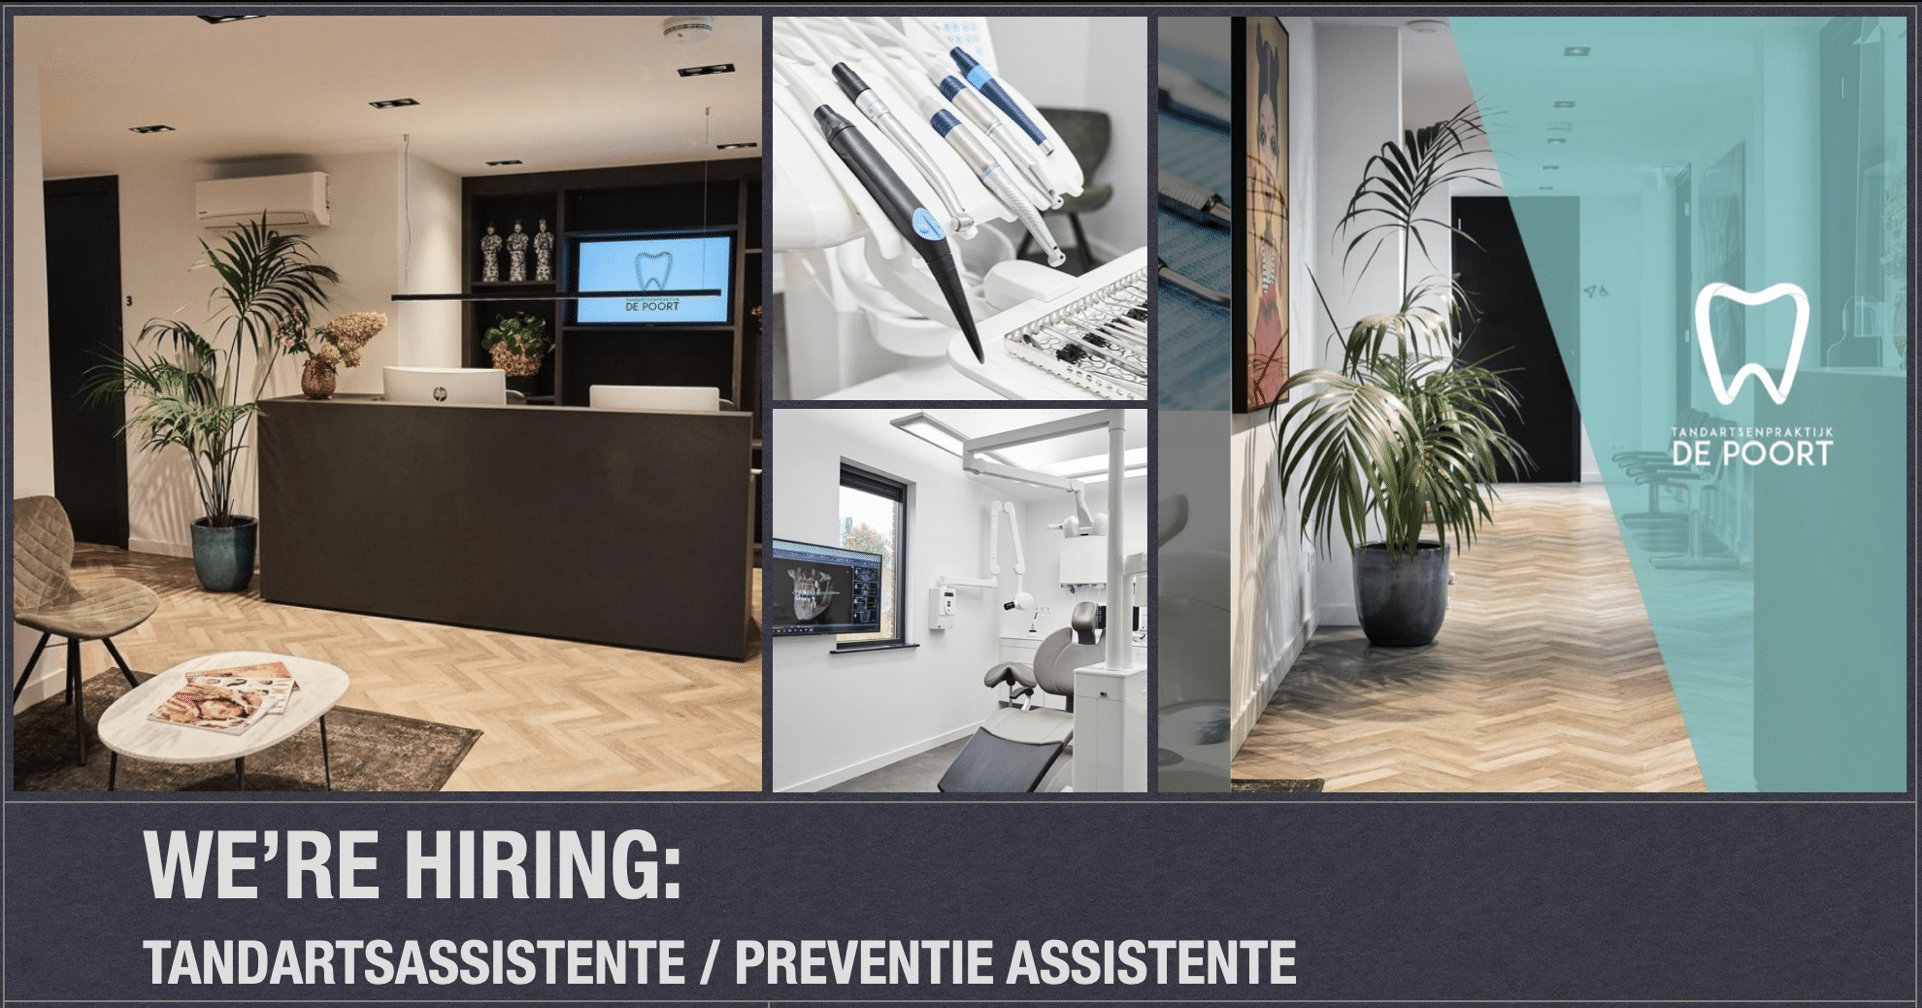 Vacature: Tandarts-assistente, preventie-assistente, oproep assistente - Nieuwegein